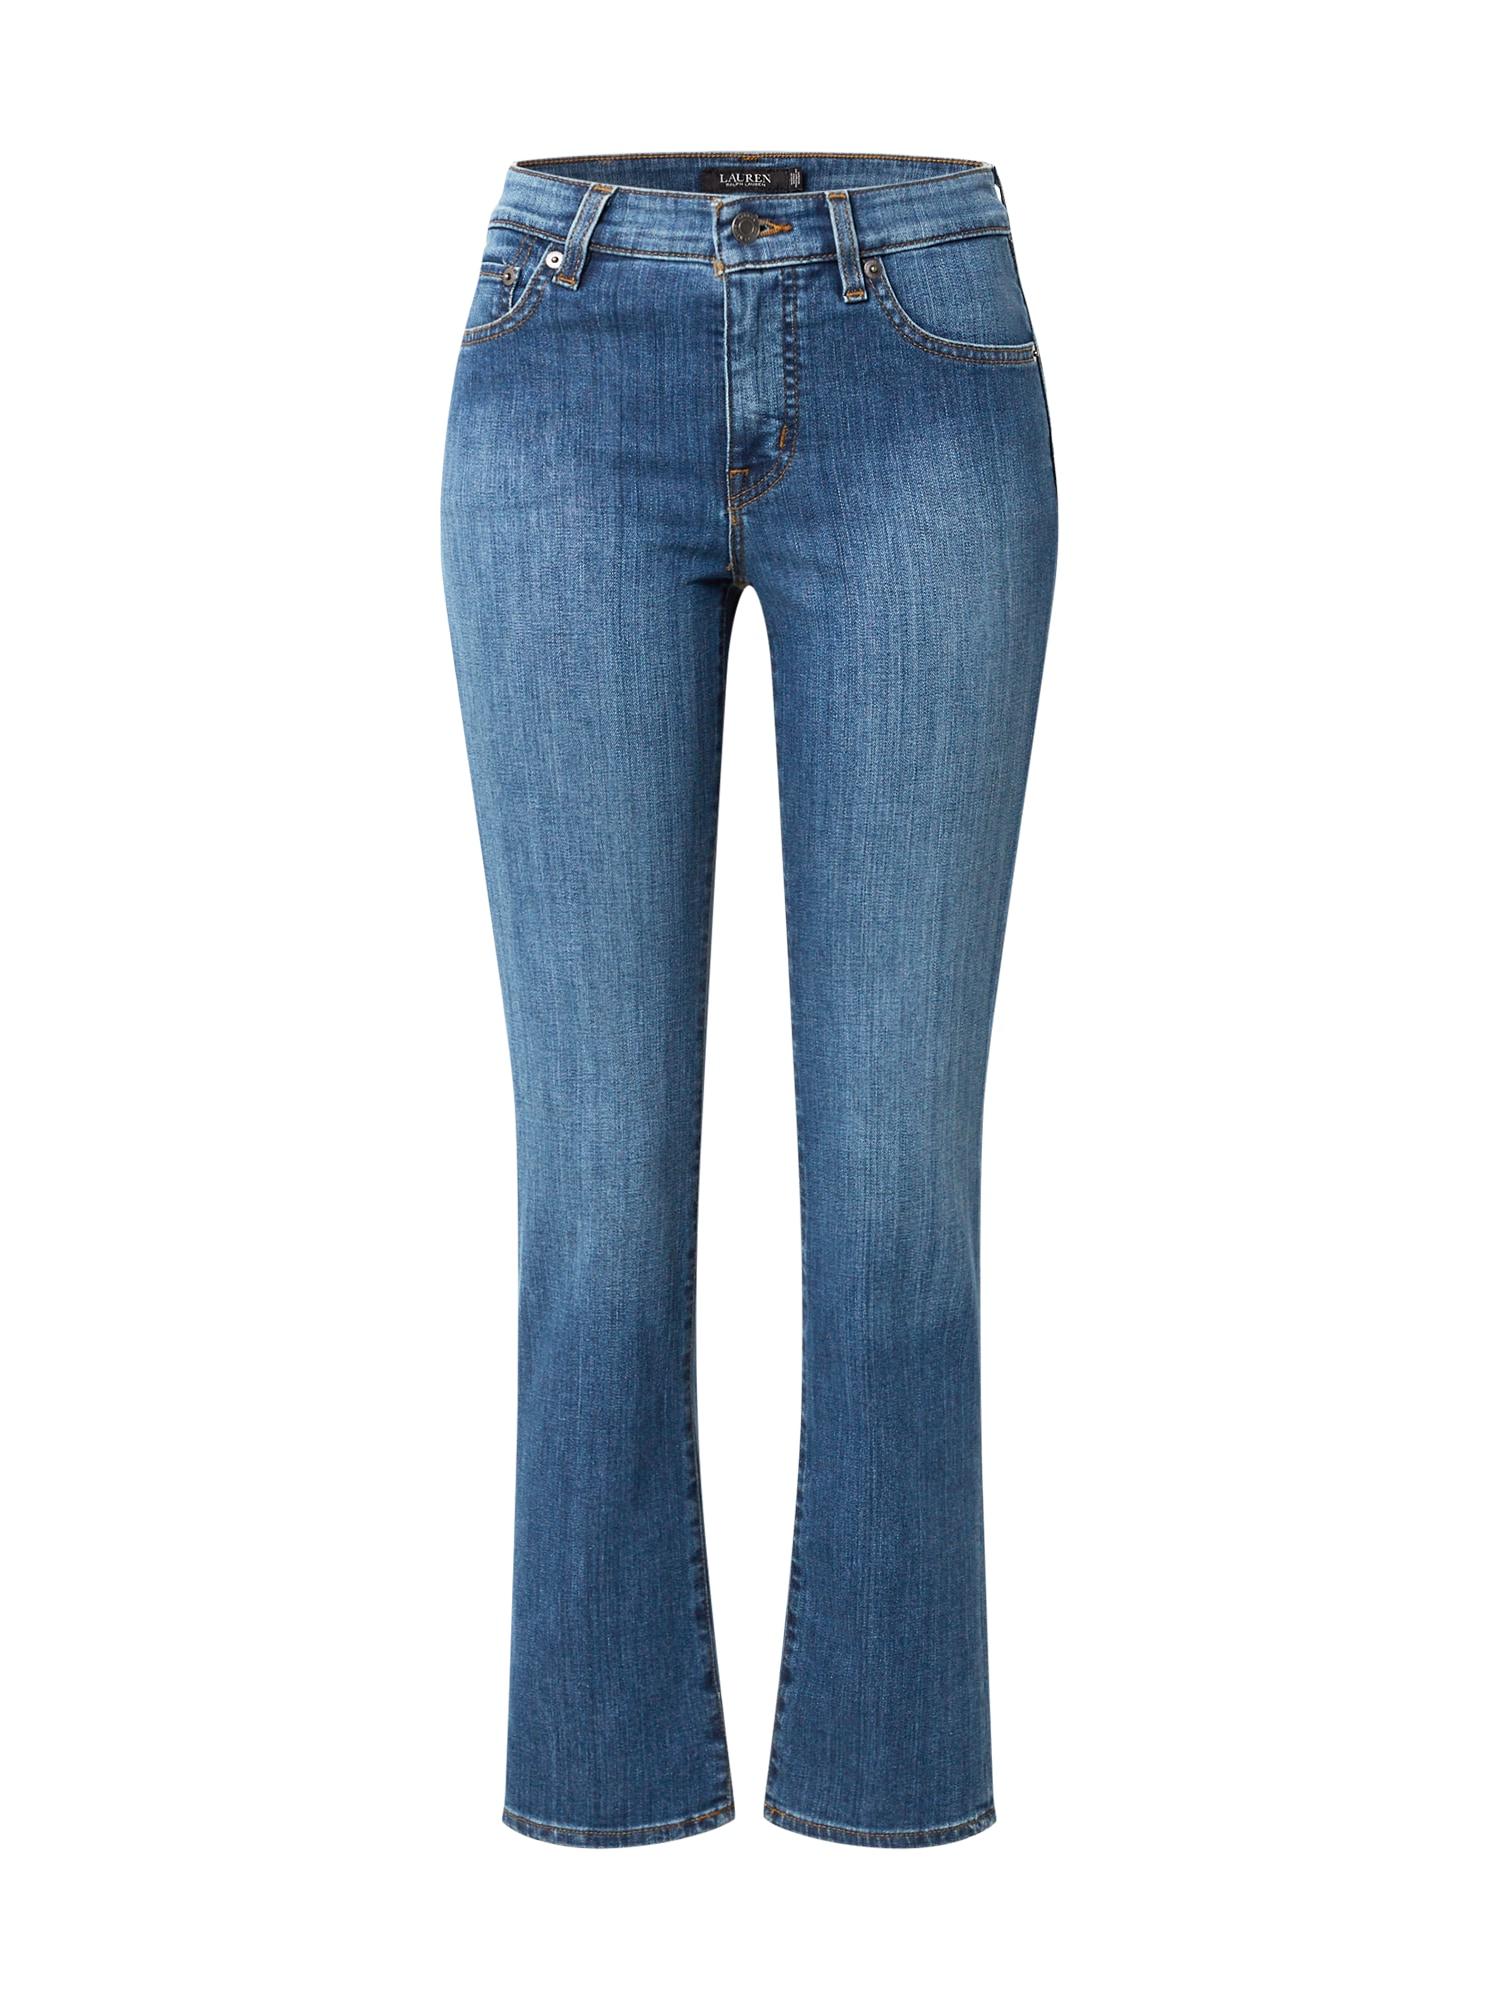 Lauren Ralph Lauren Džinsai tamsiai (džinso) mėlyna